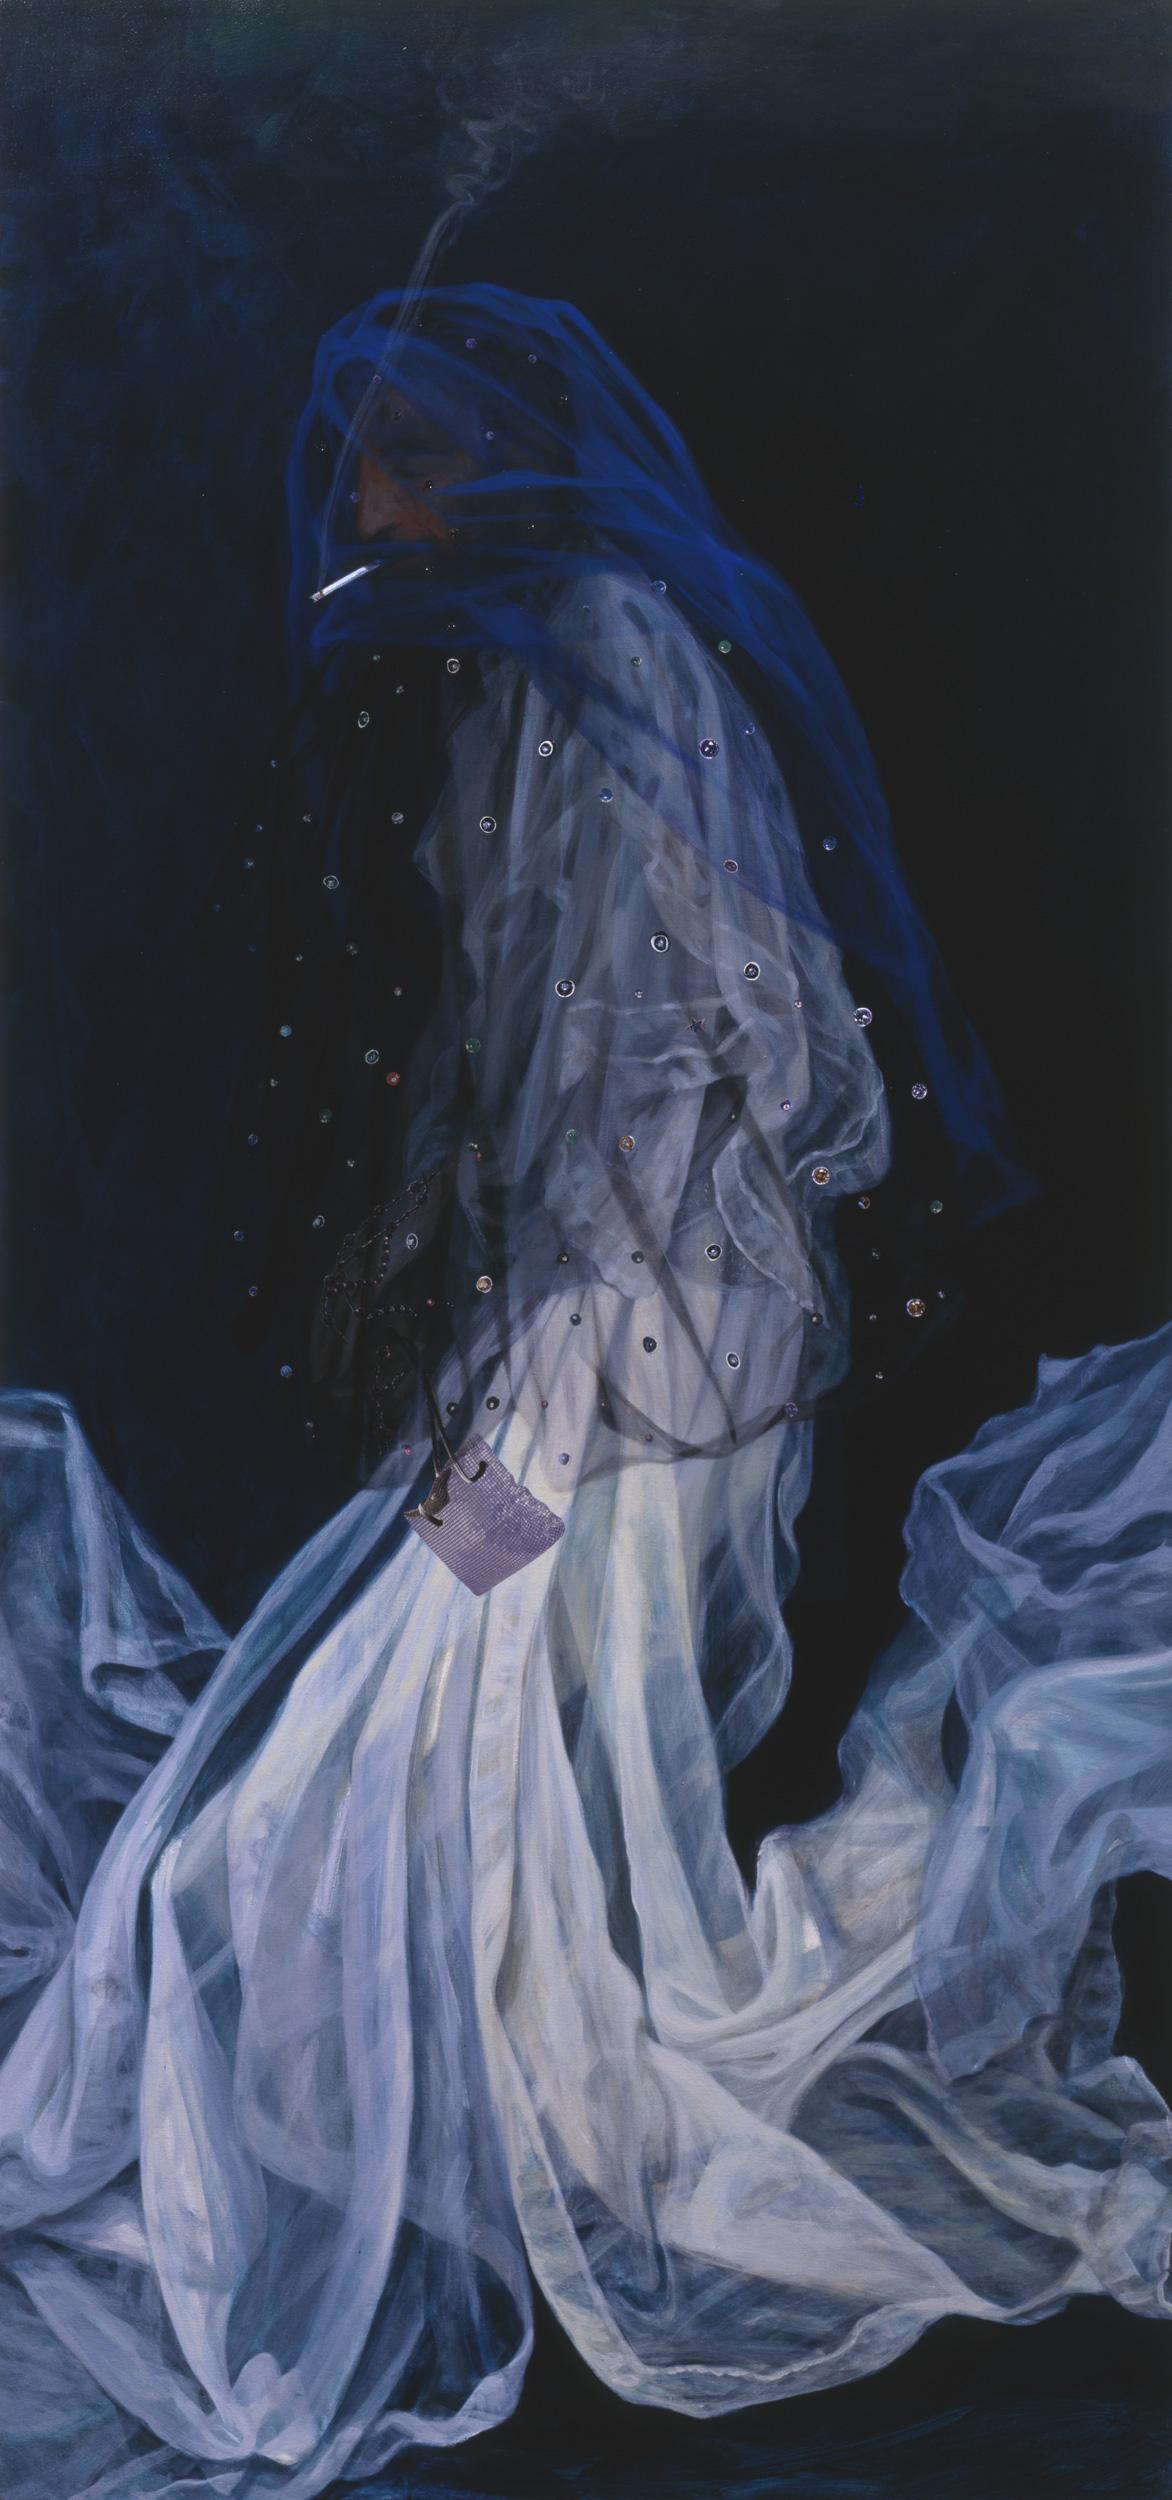 "Old Art Hub, 2000, acrylic, oil, collage on canvas, 76"" x 35.5"""